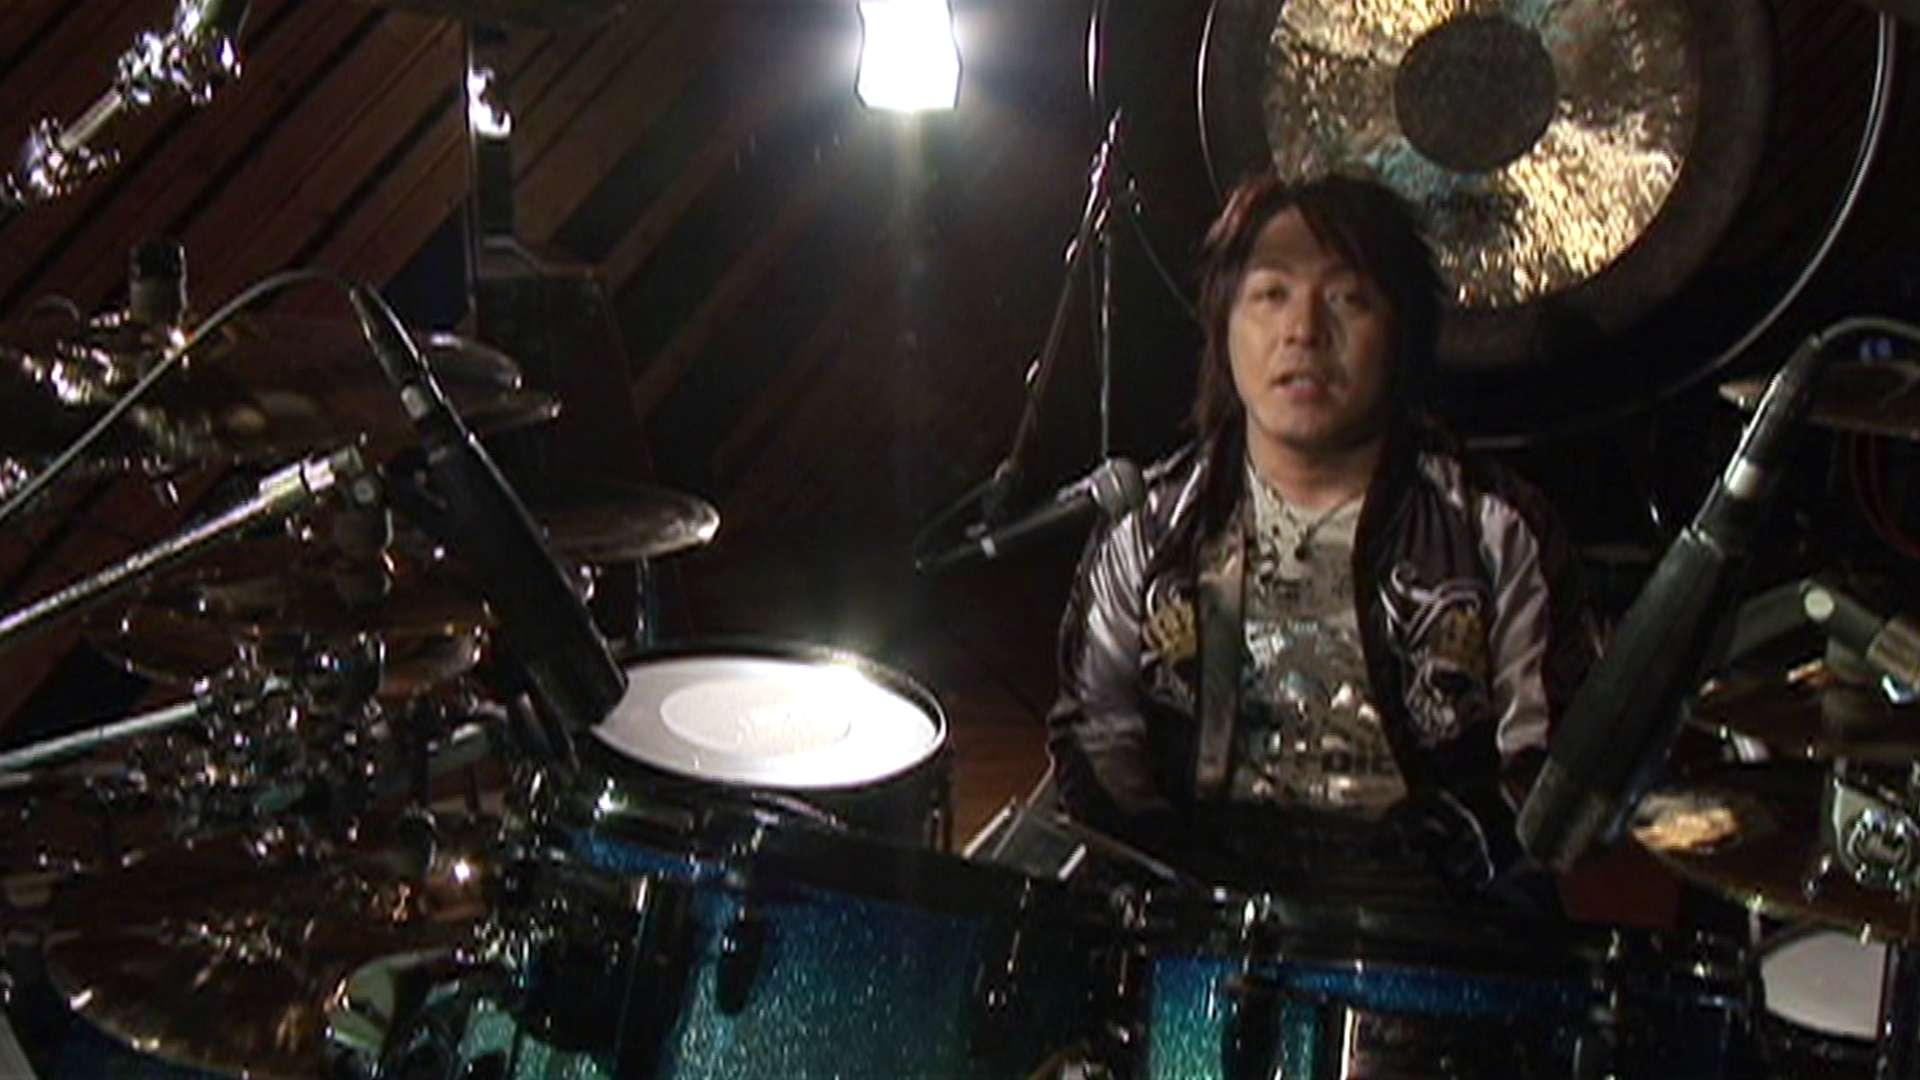 shuji 直伝 Pleasure of drumming